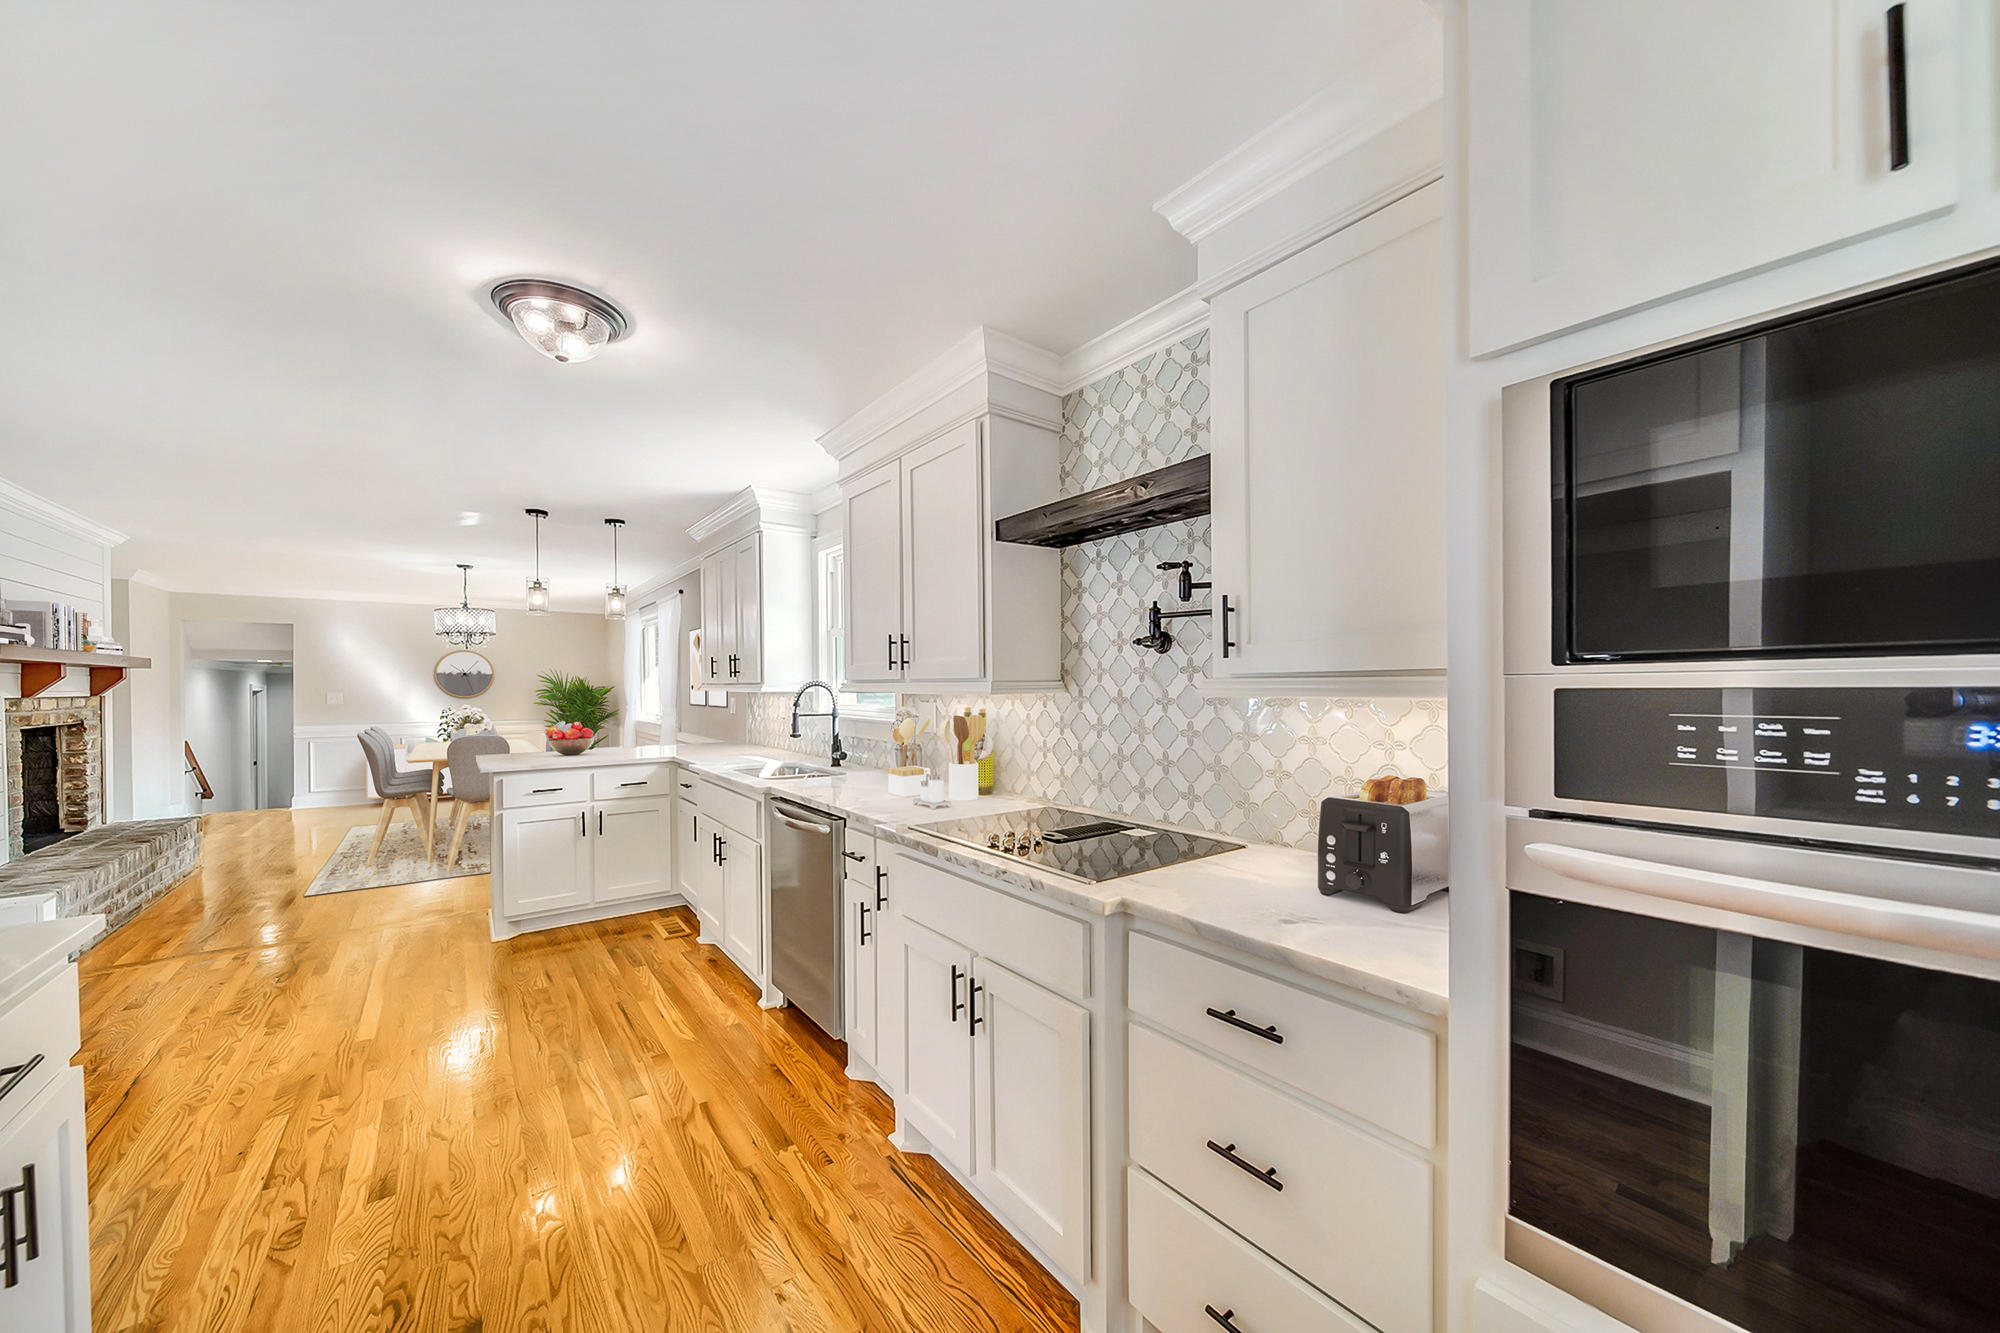 Country Club II Homes For Sale - 1477 Burningtree, Charleston, SC - 25